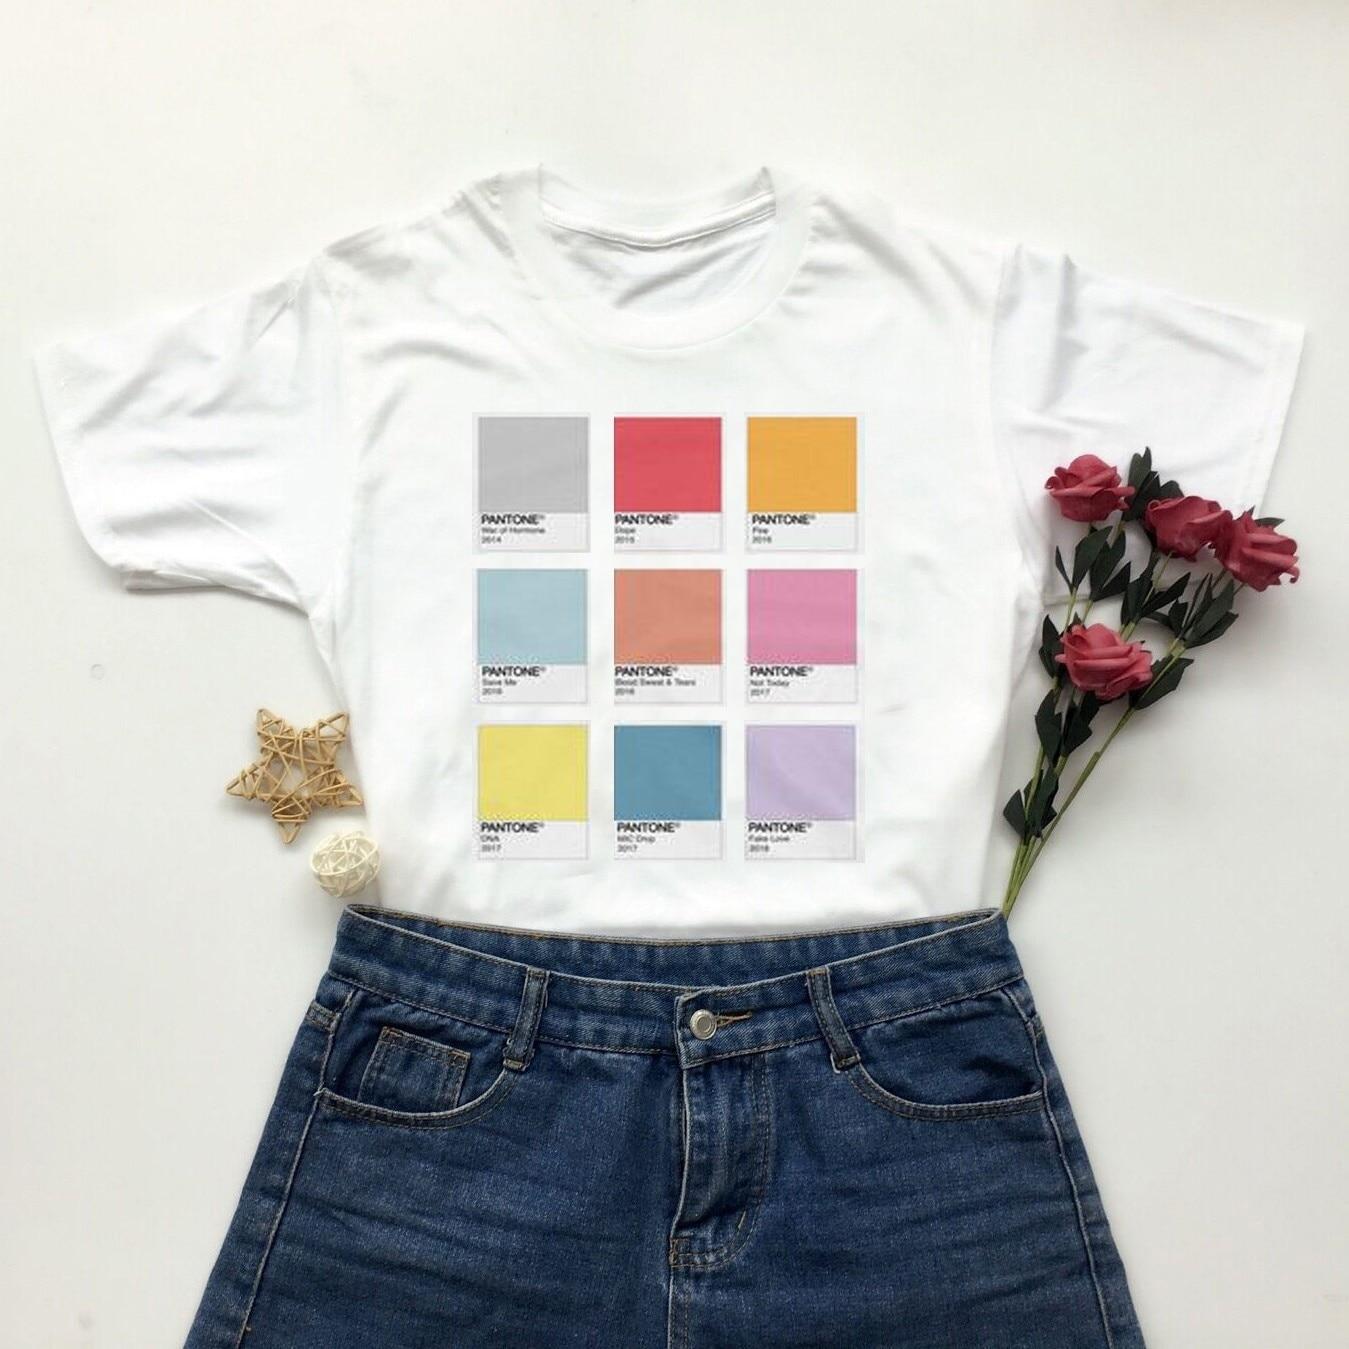 Женская футболка kuakuayu HJN, белая футболка с пламенем